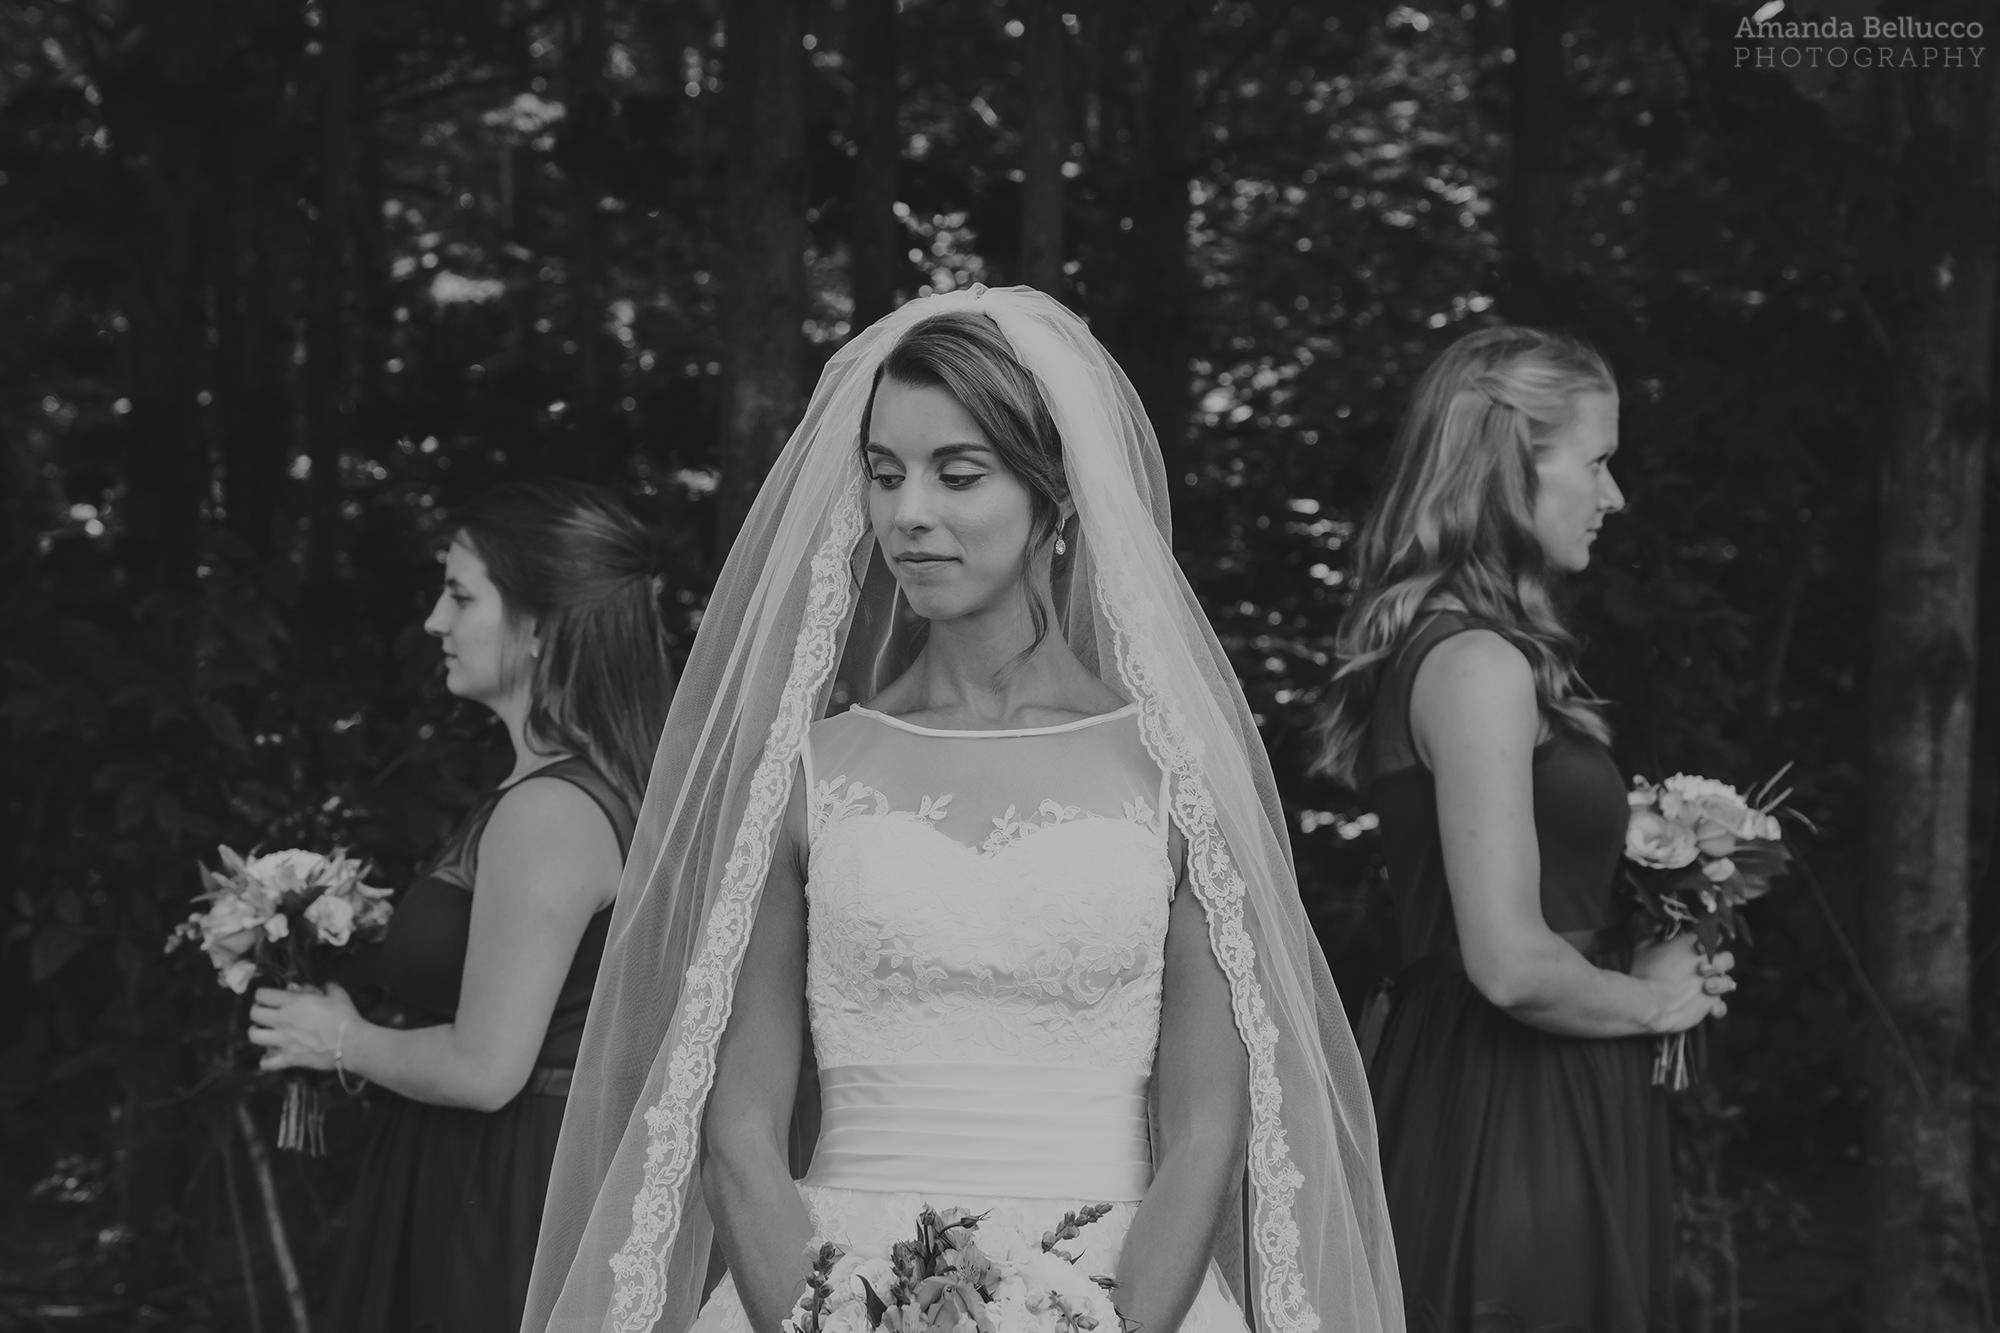 buffalo_ny_wedding_photographer_48.jpg